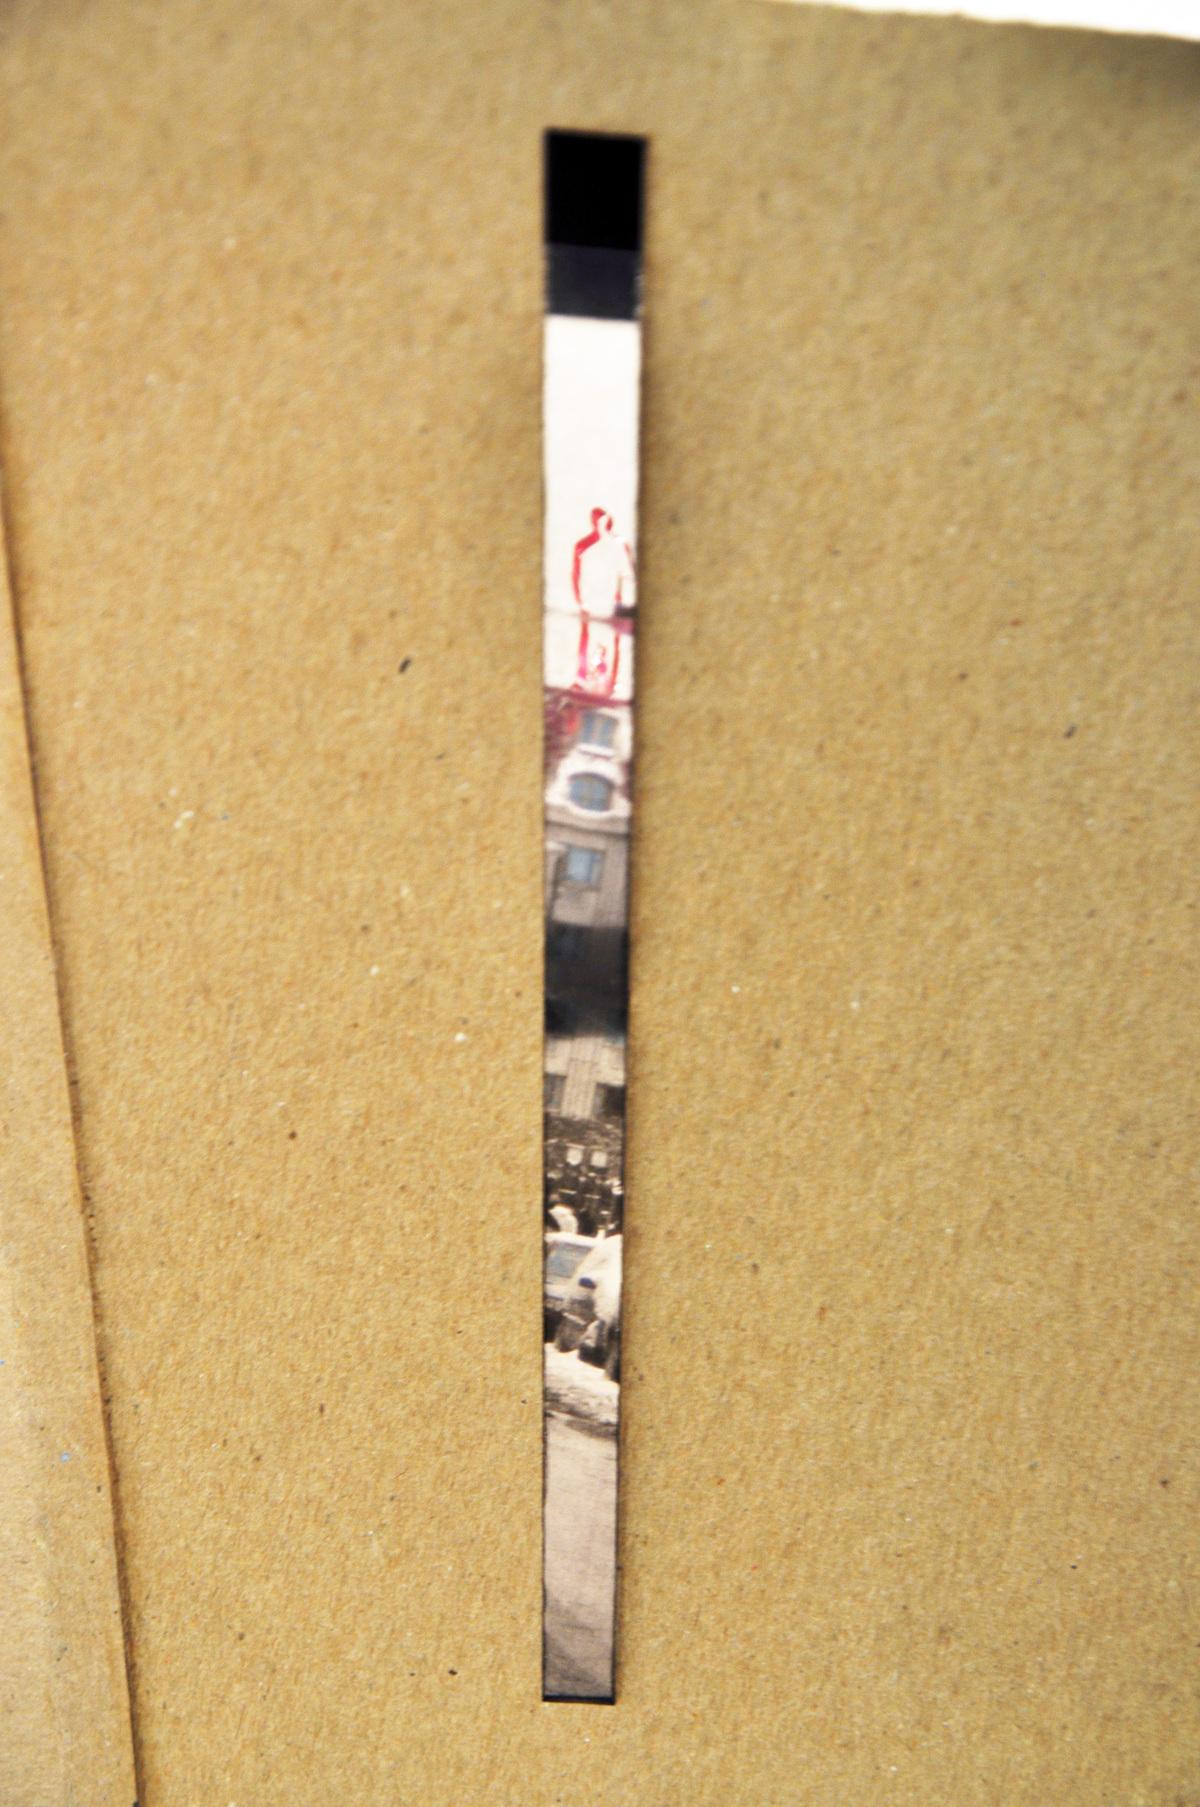 Model: view through vertical window